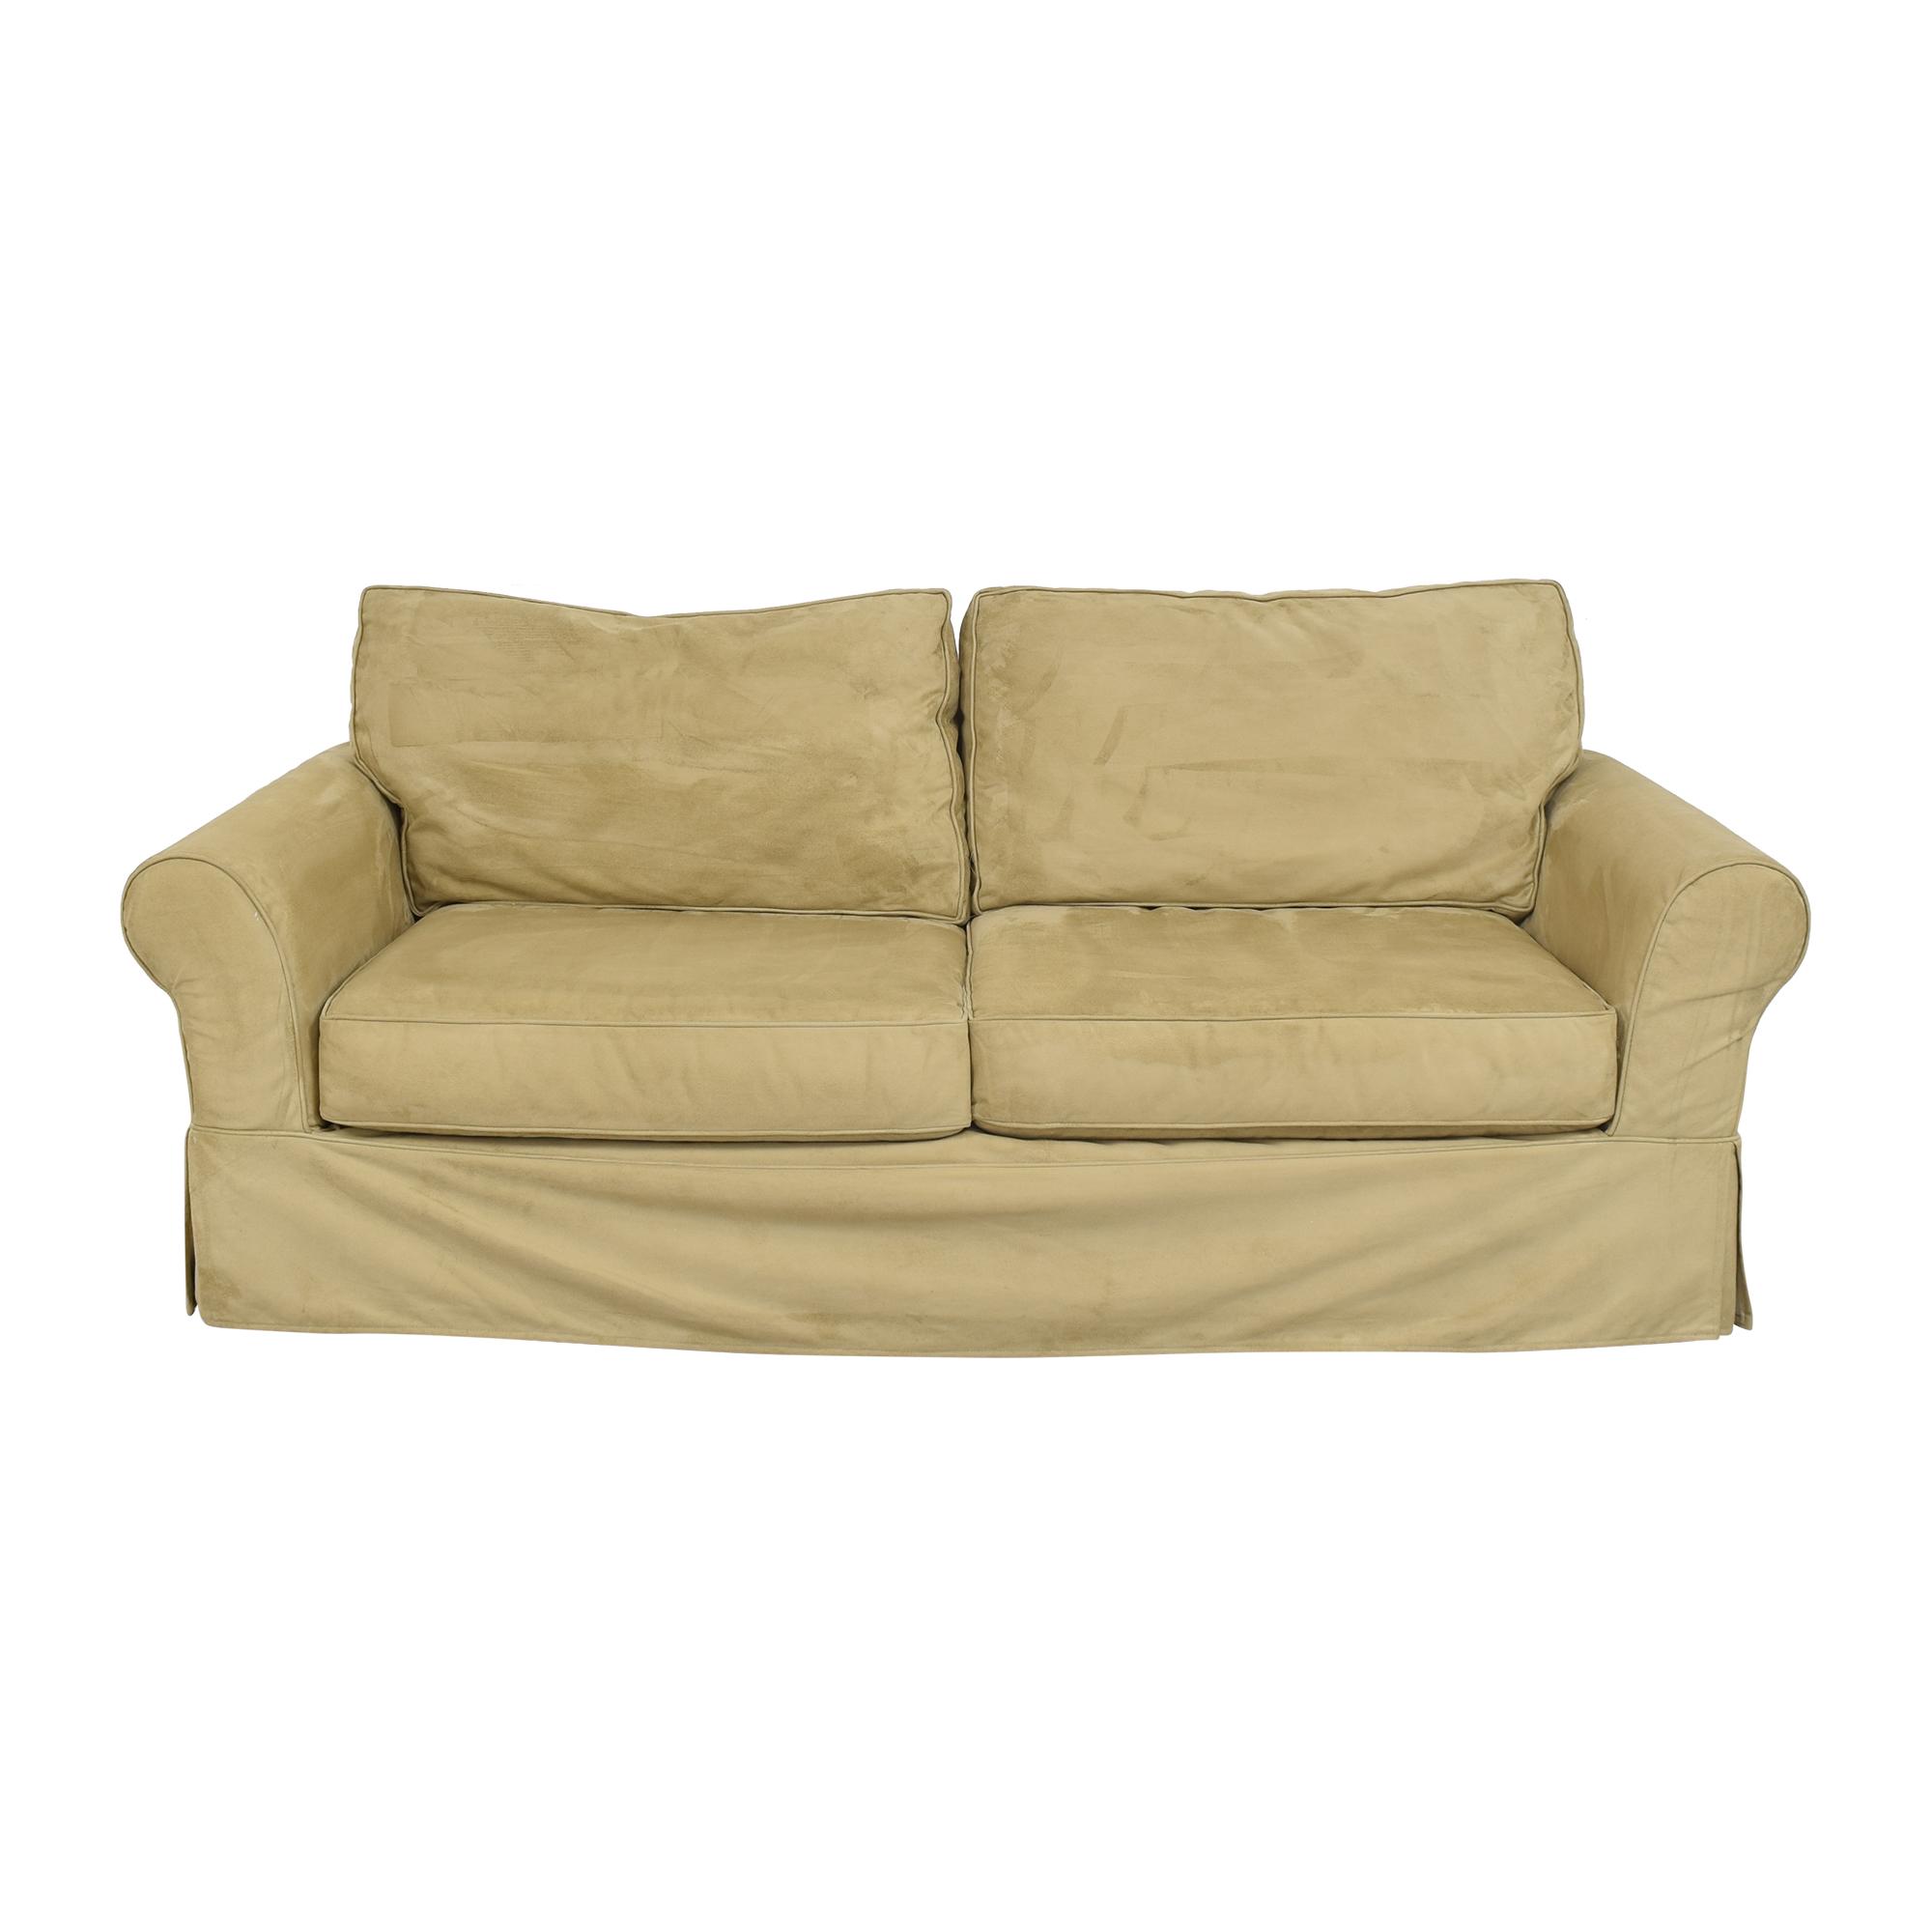 Pottery Barn Pottery Barn Comfort Roll Arm Slipcovered Sofa